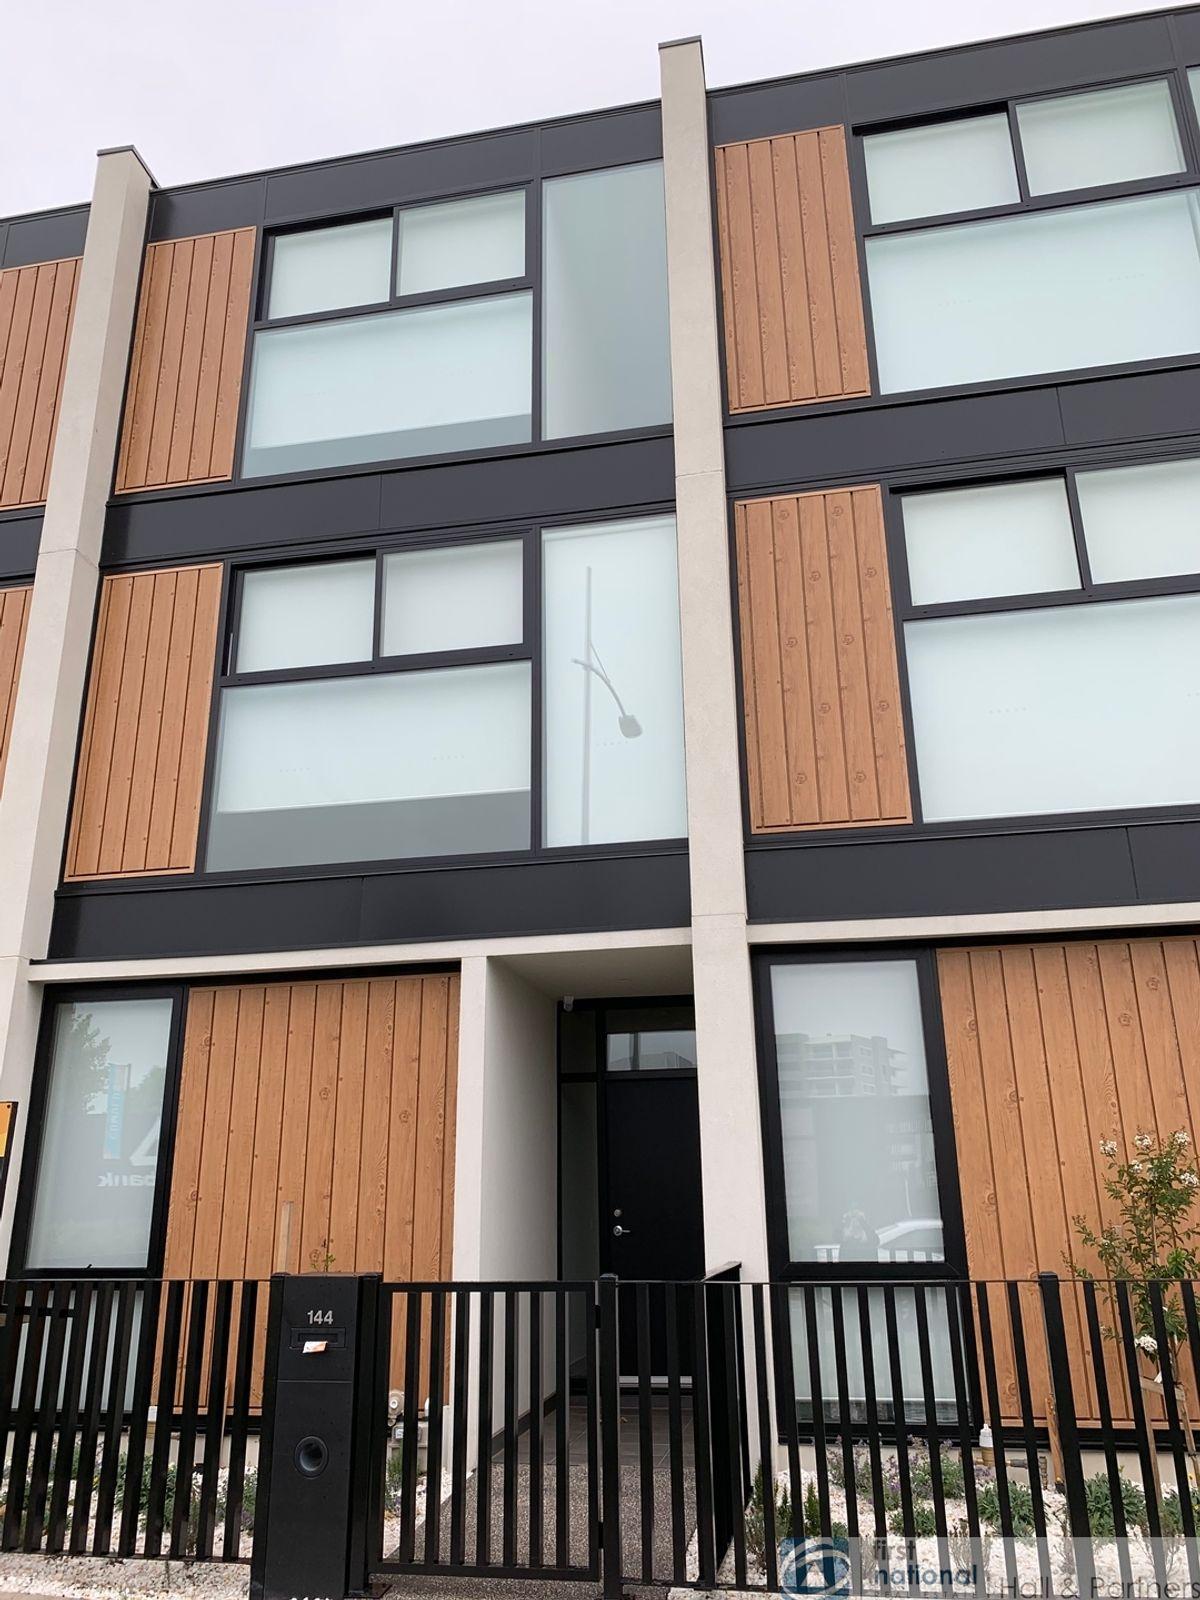 144 Keneally Street, Dandenong, VIC 3175